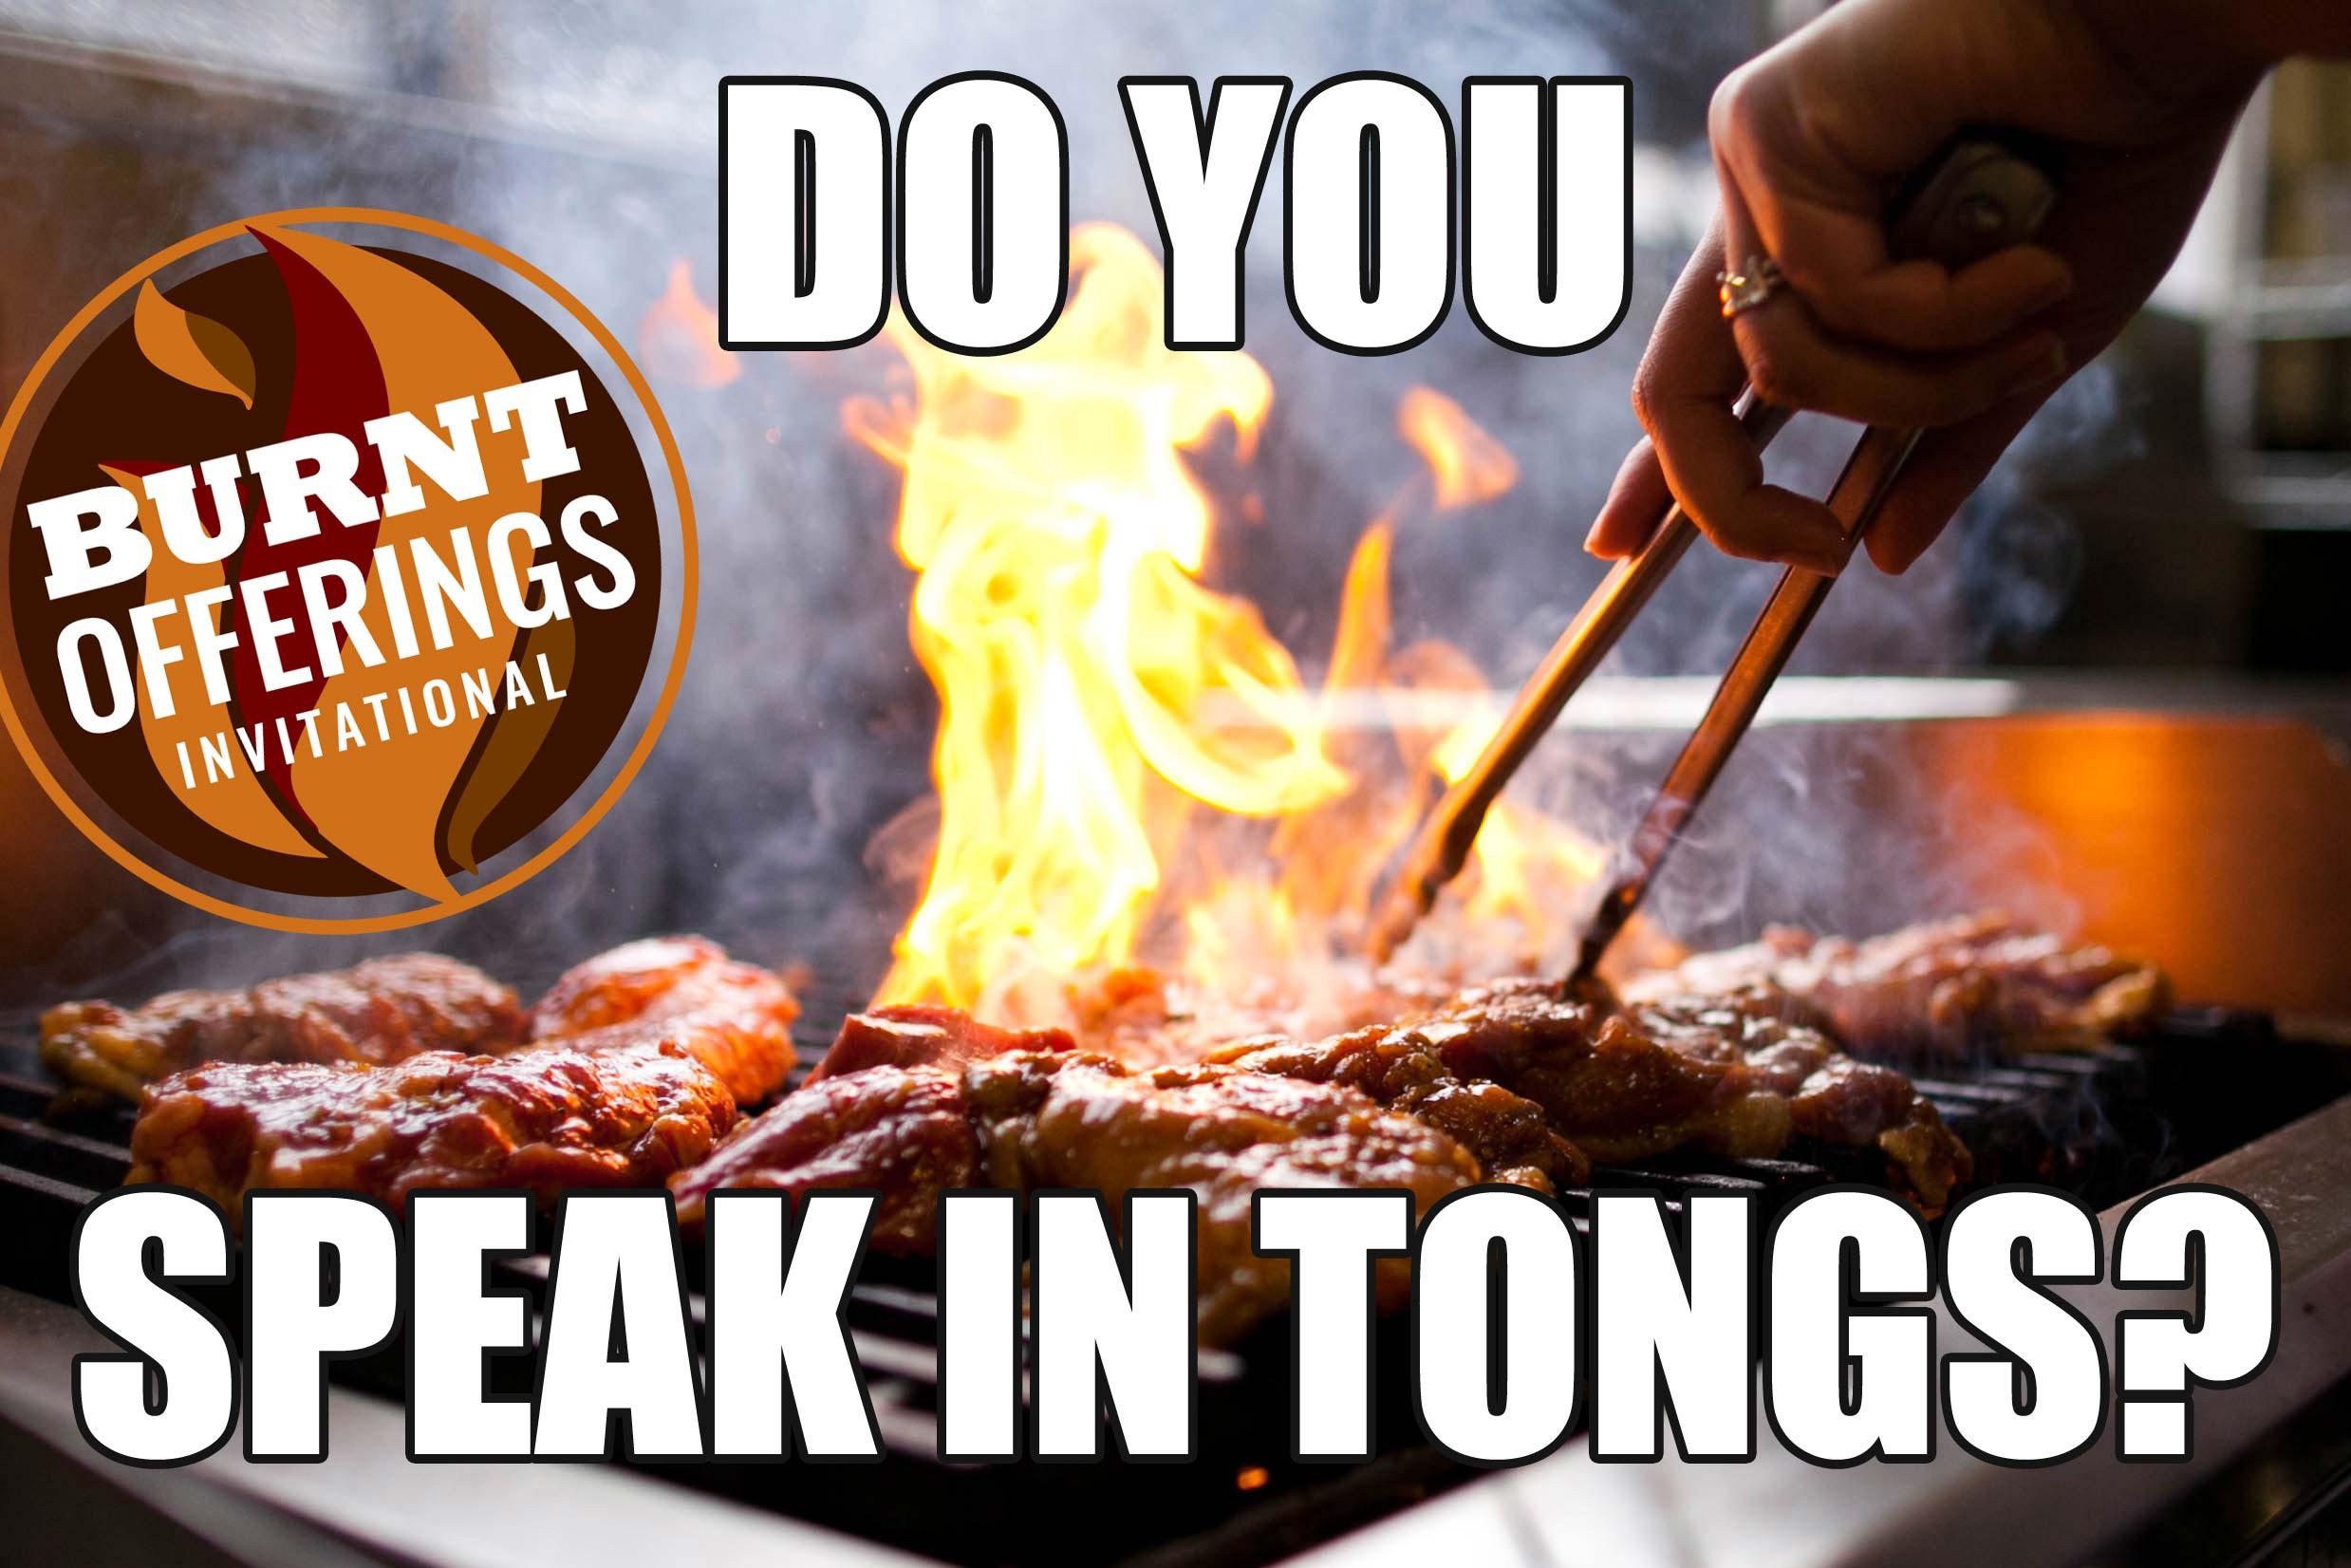 Do you speak in tongs?